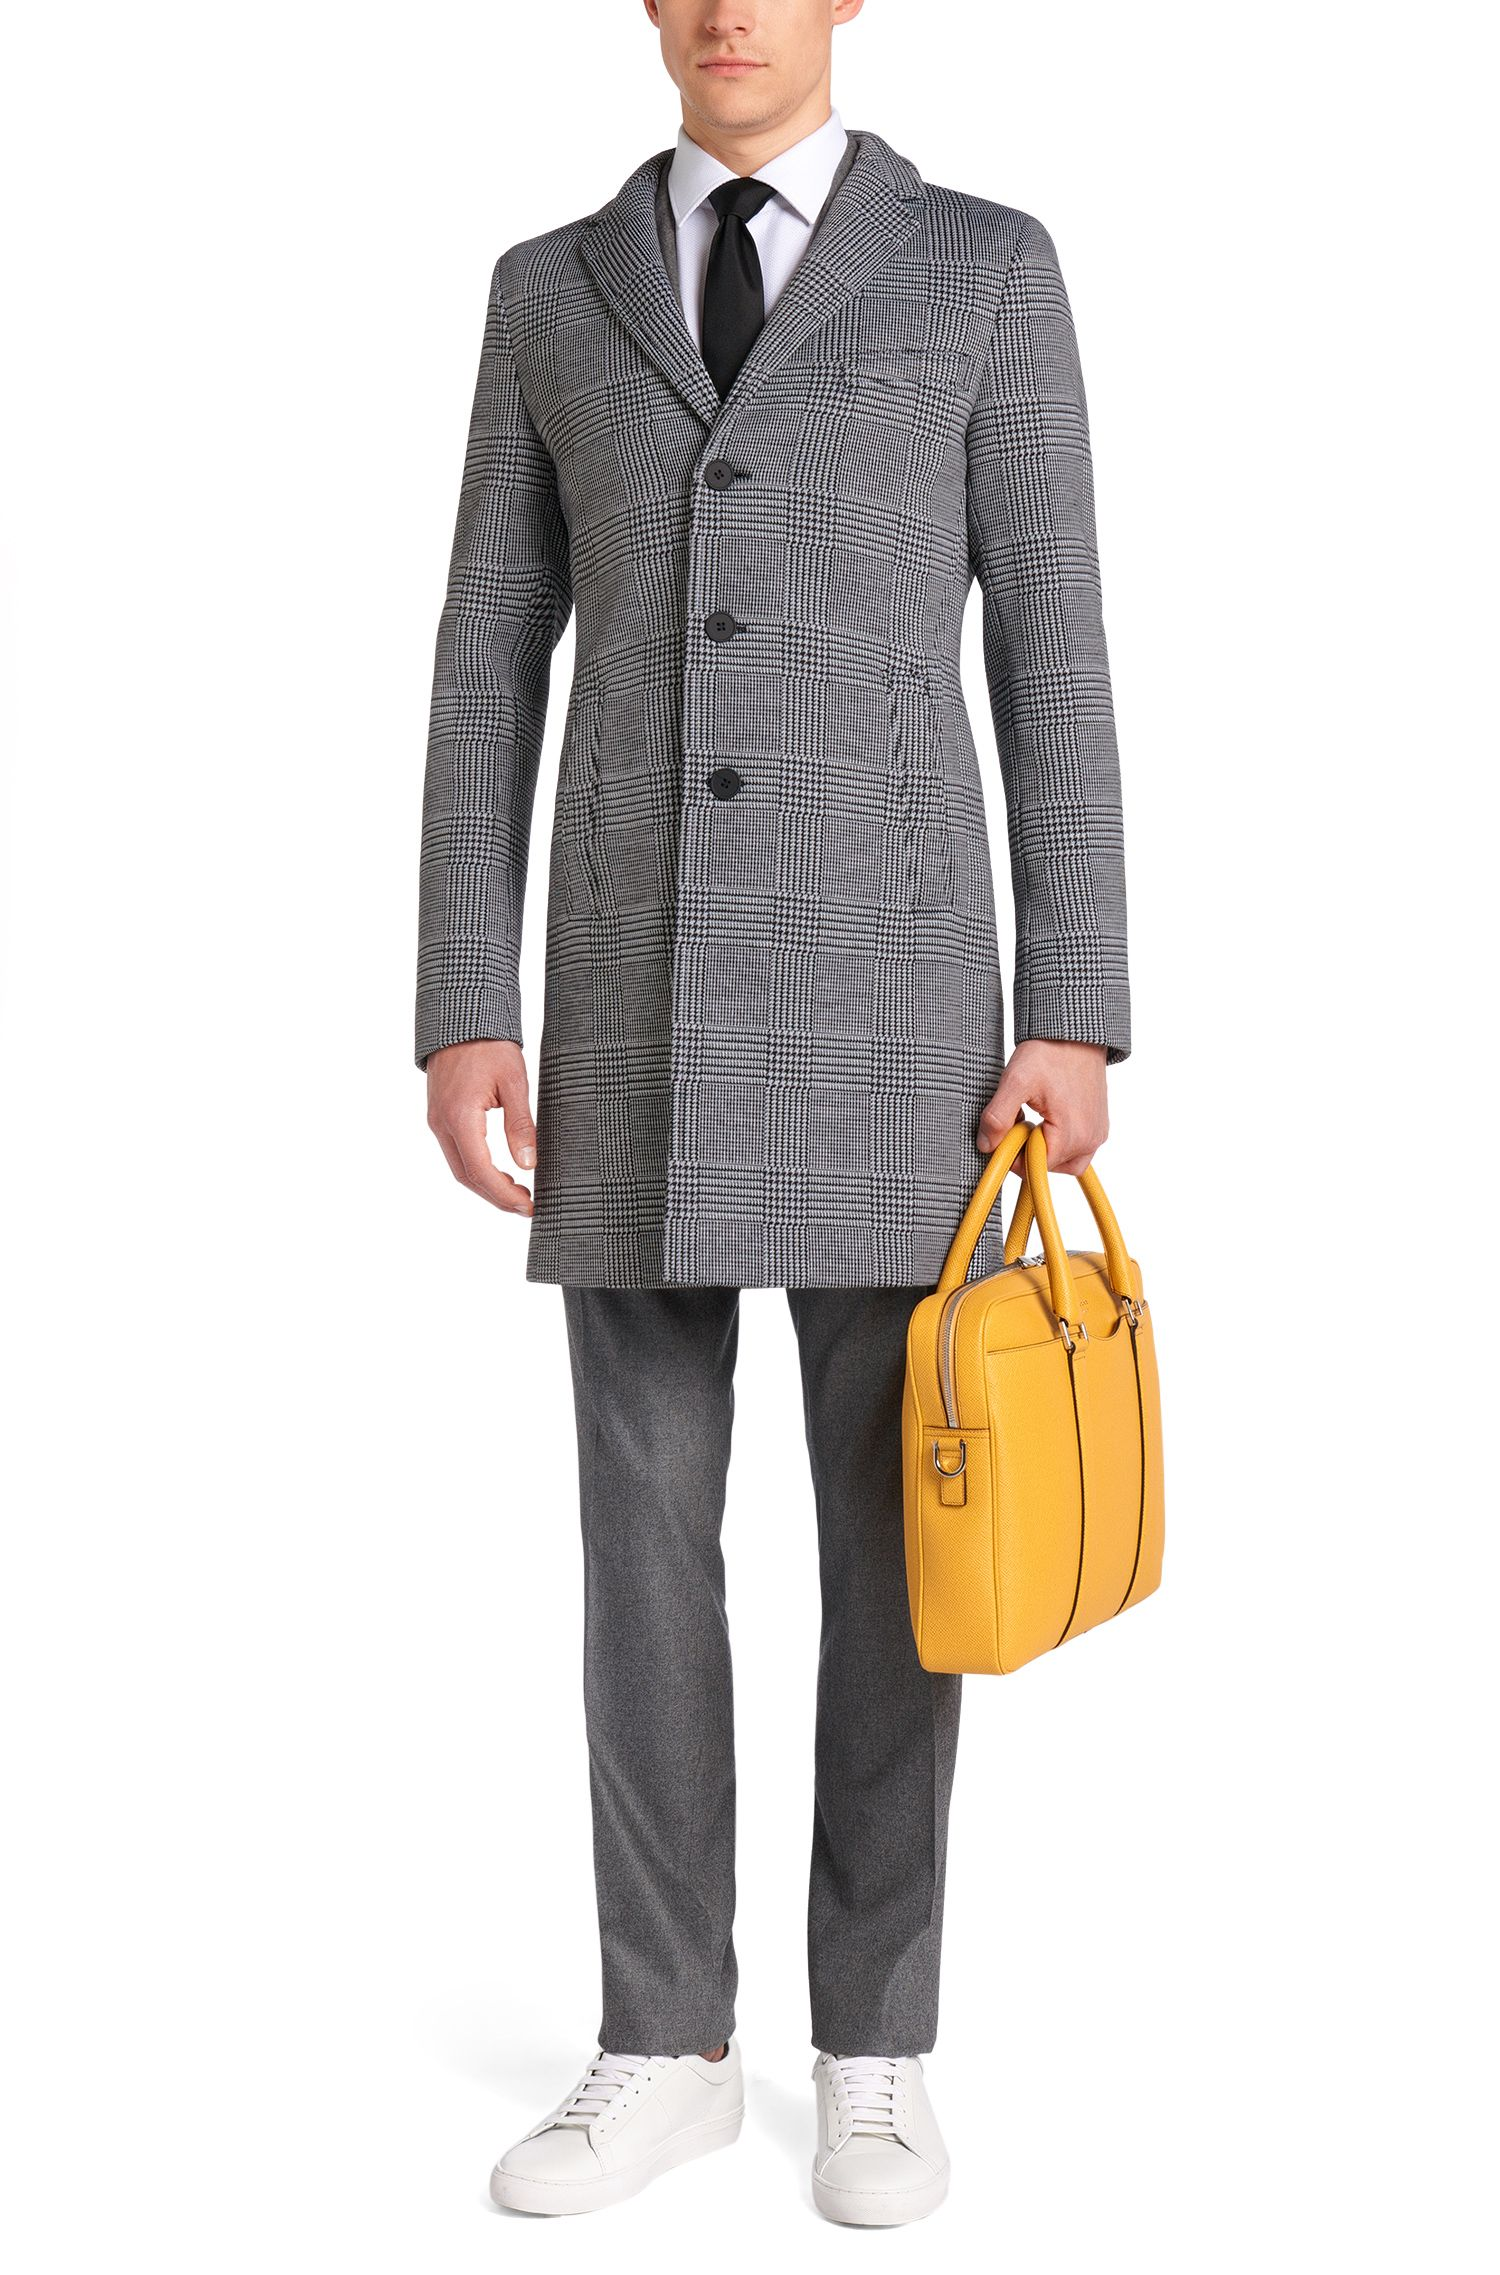 Mantel mit Glencheck-Muster: 'Shawn2'